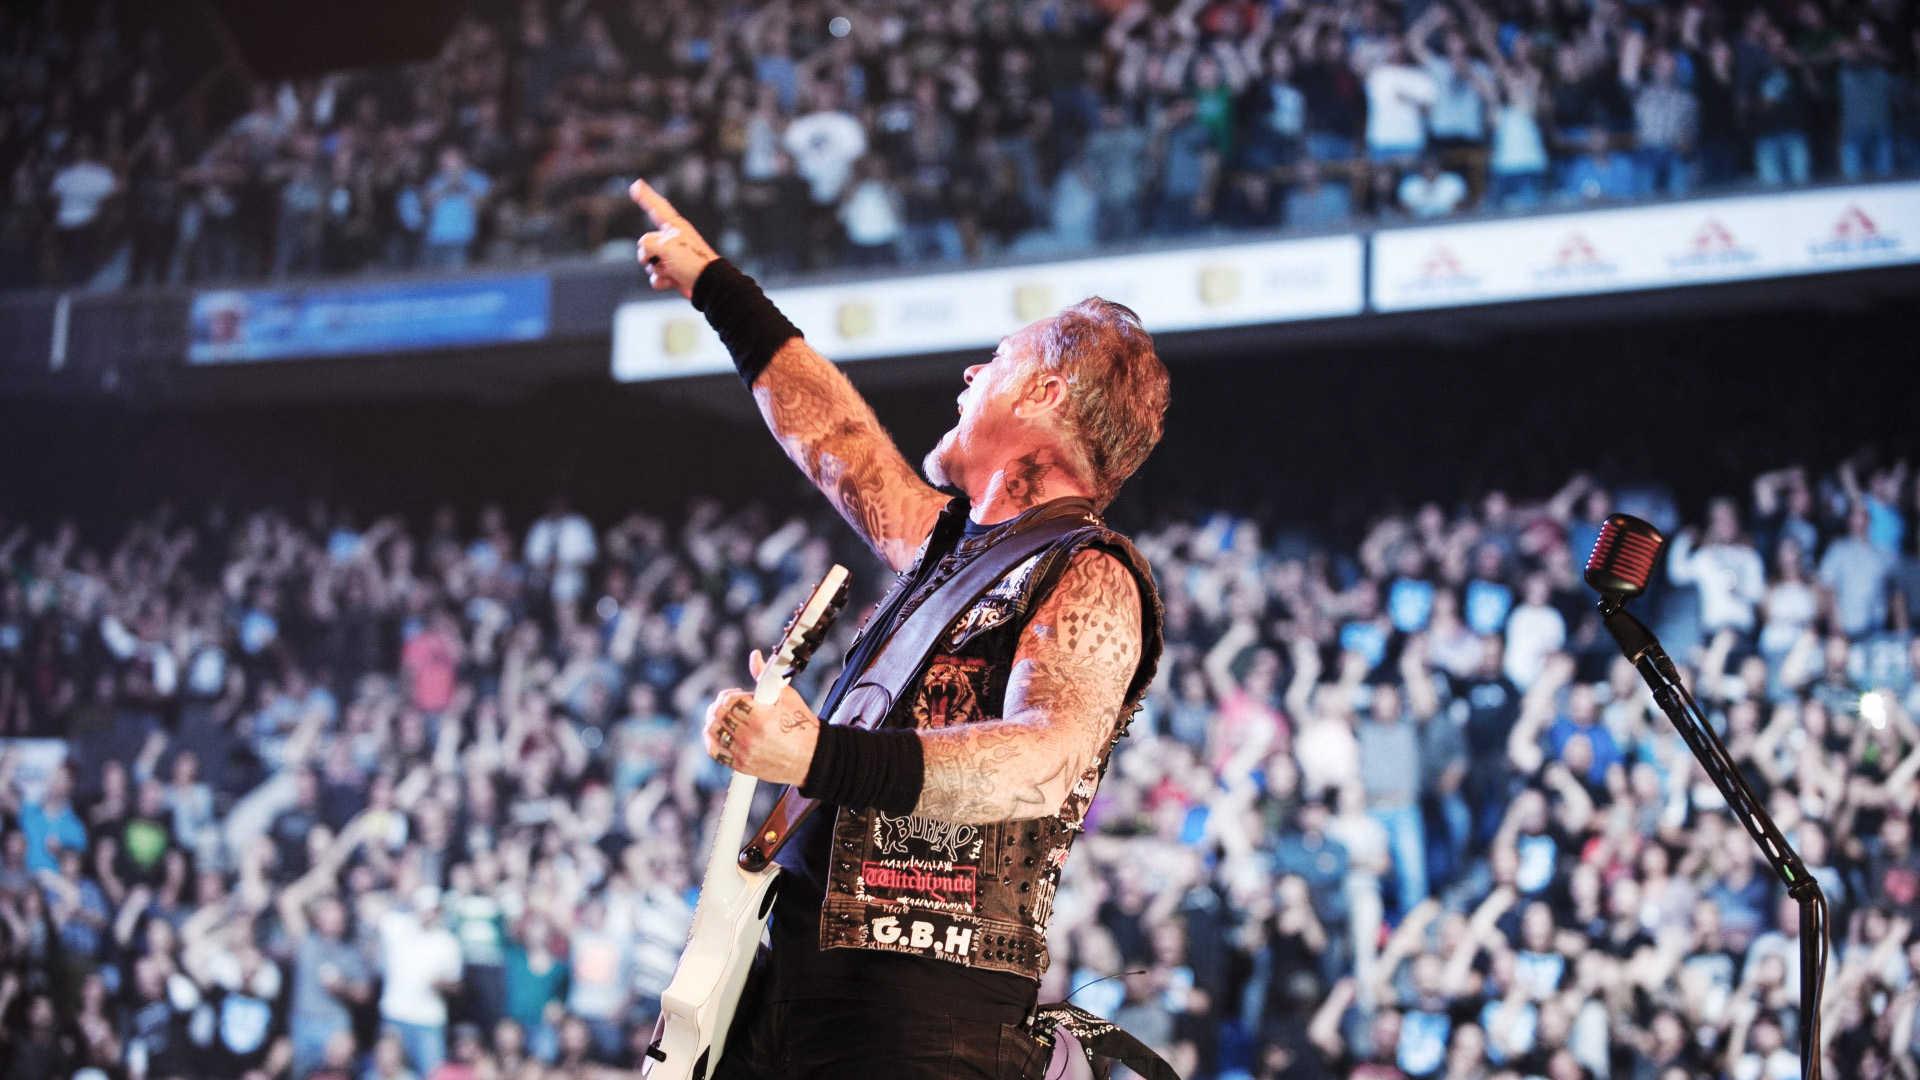 Hd wallpaper upload - Wallpaper Metallica James Hetfield Hd Wallpapers 1080p Upload At